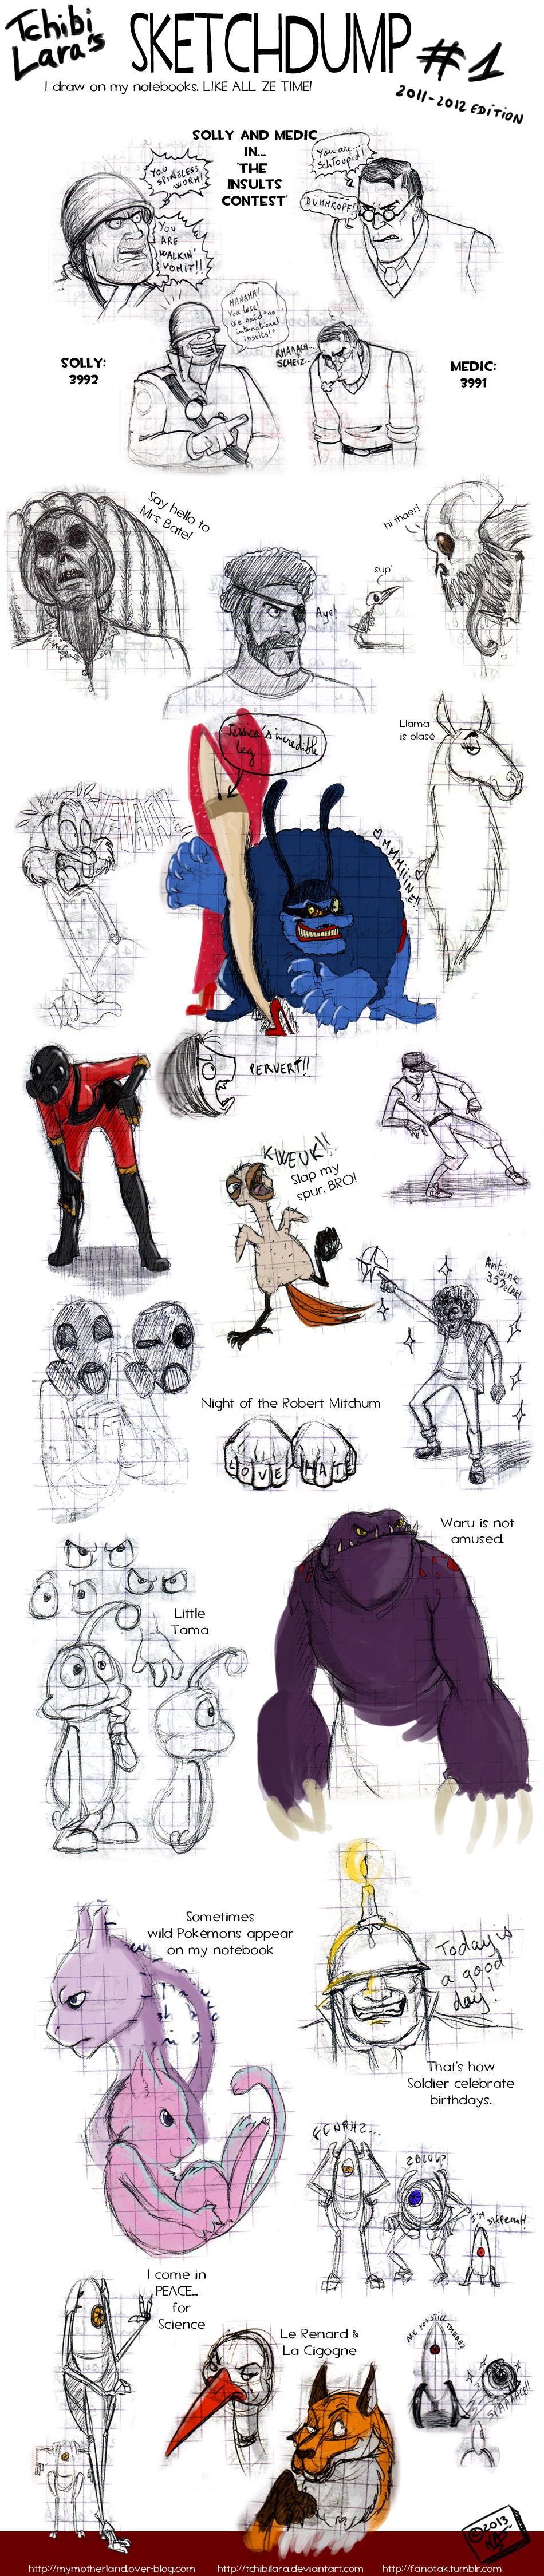 http://fc00.deviantart.net/fs70/f/2013/065/1/5/sketchdump1_by_tchibilara-d5x4y2f.jpg